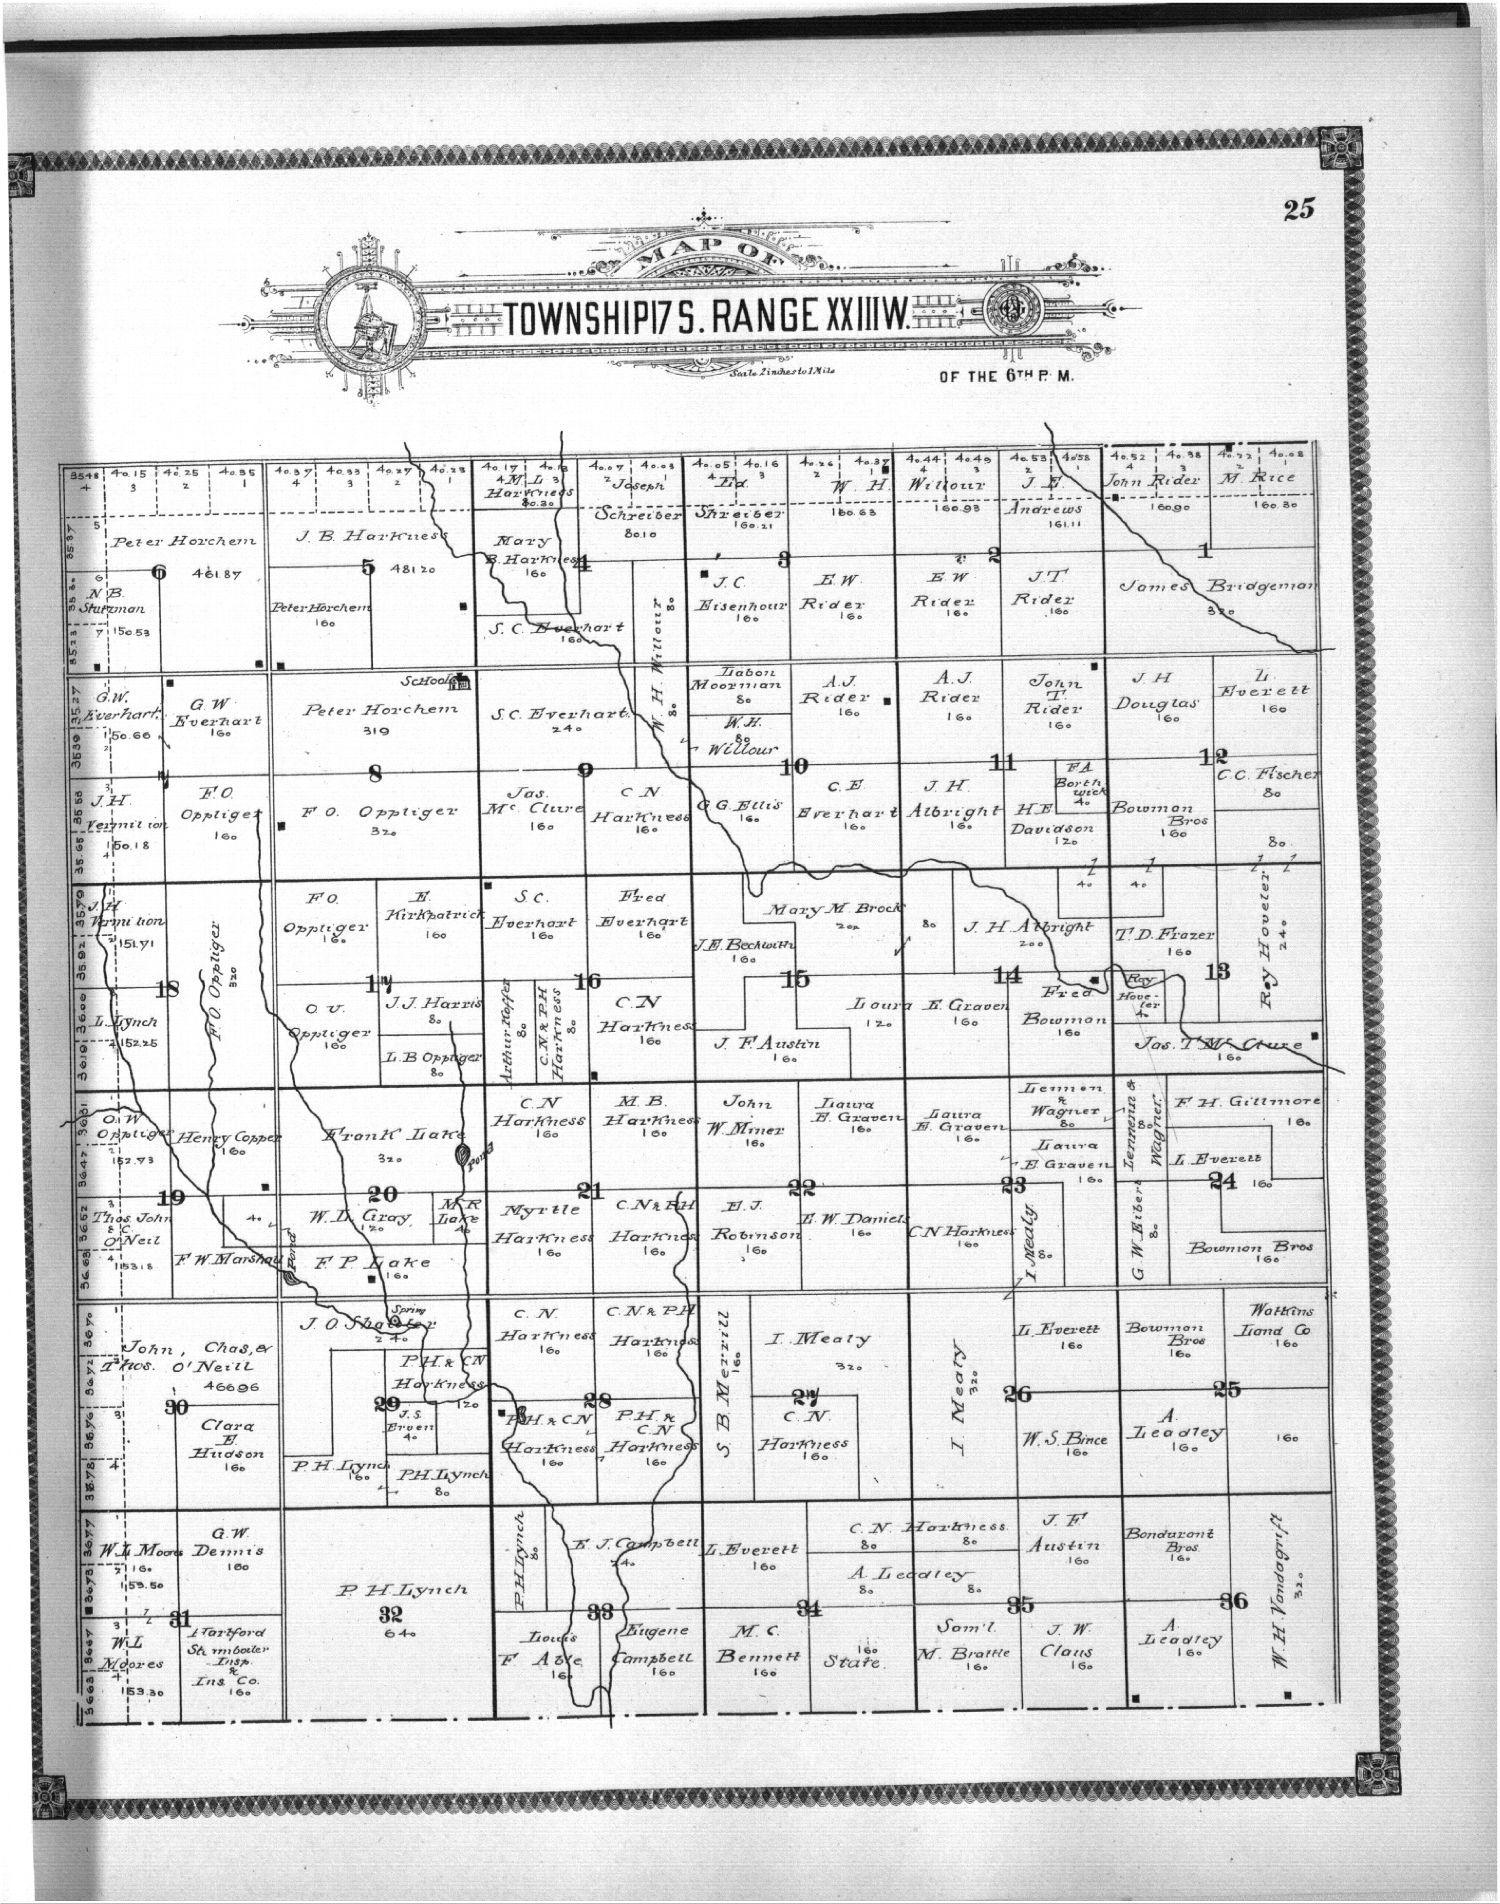 Standard atlas of Ness County, Kansas - 25